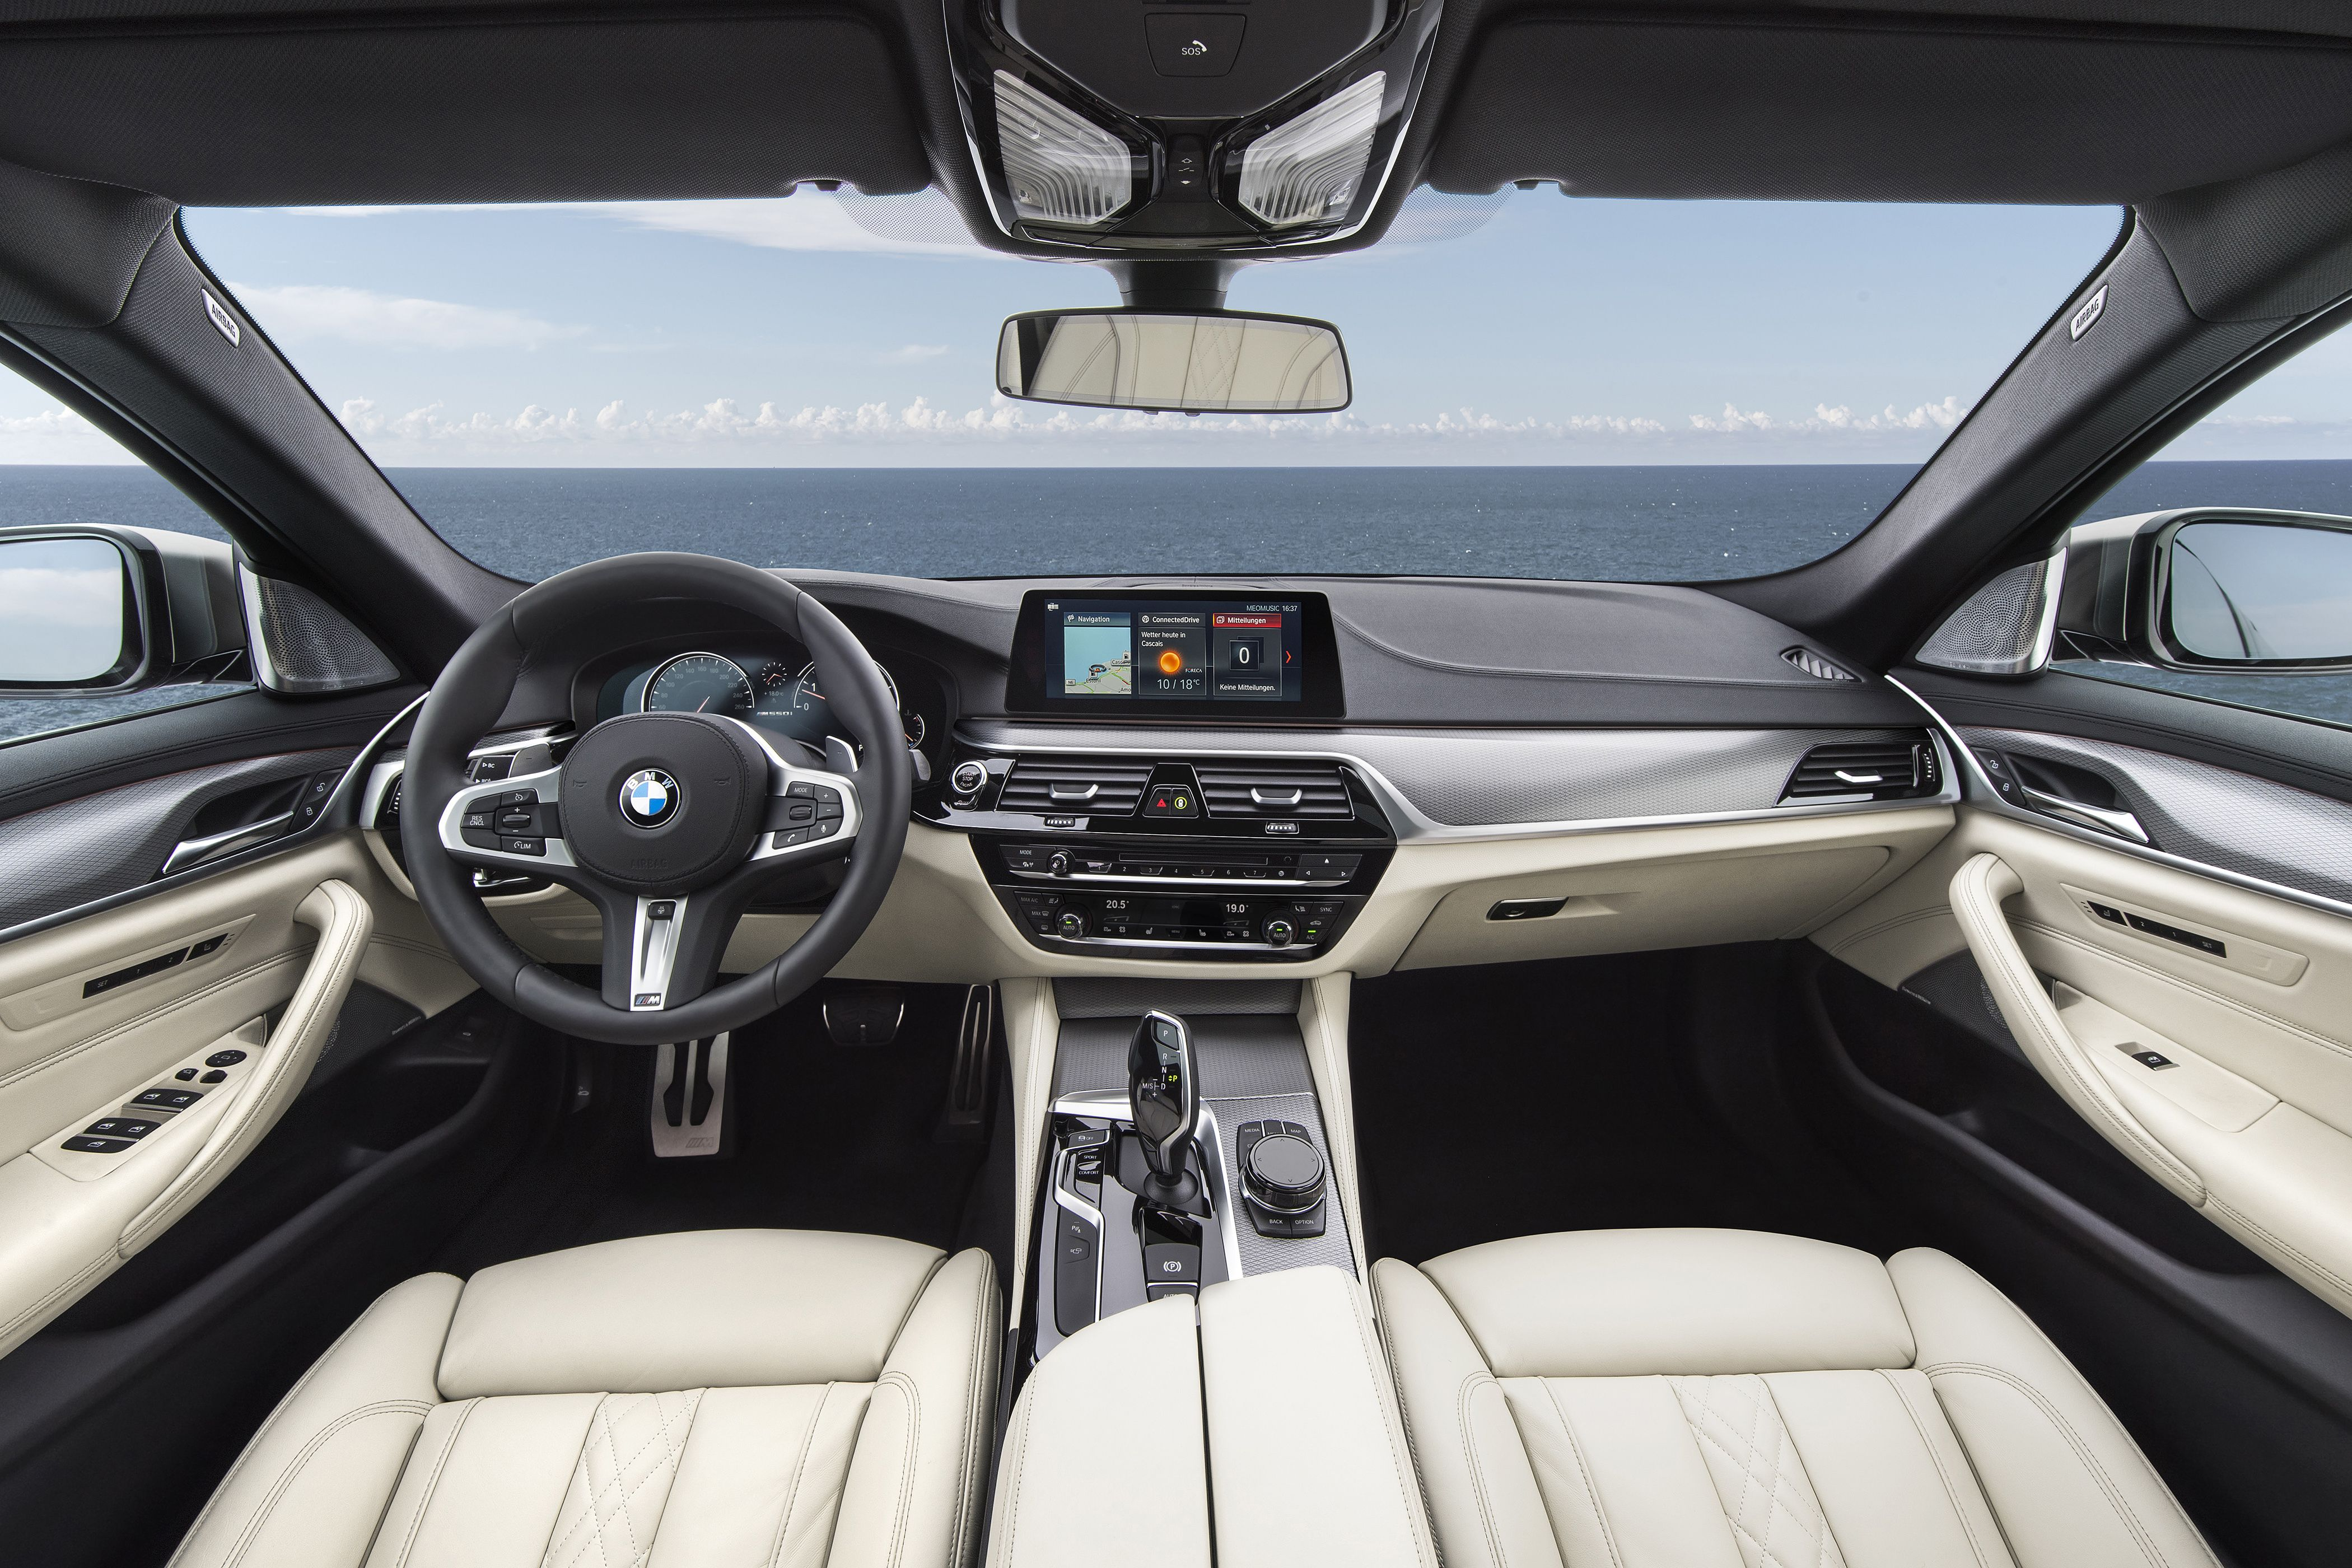 BMW #G30 #M550i #Sedan #xDrive #Monster #Luxury #MPerformance